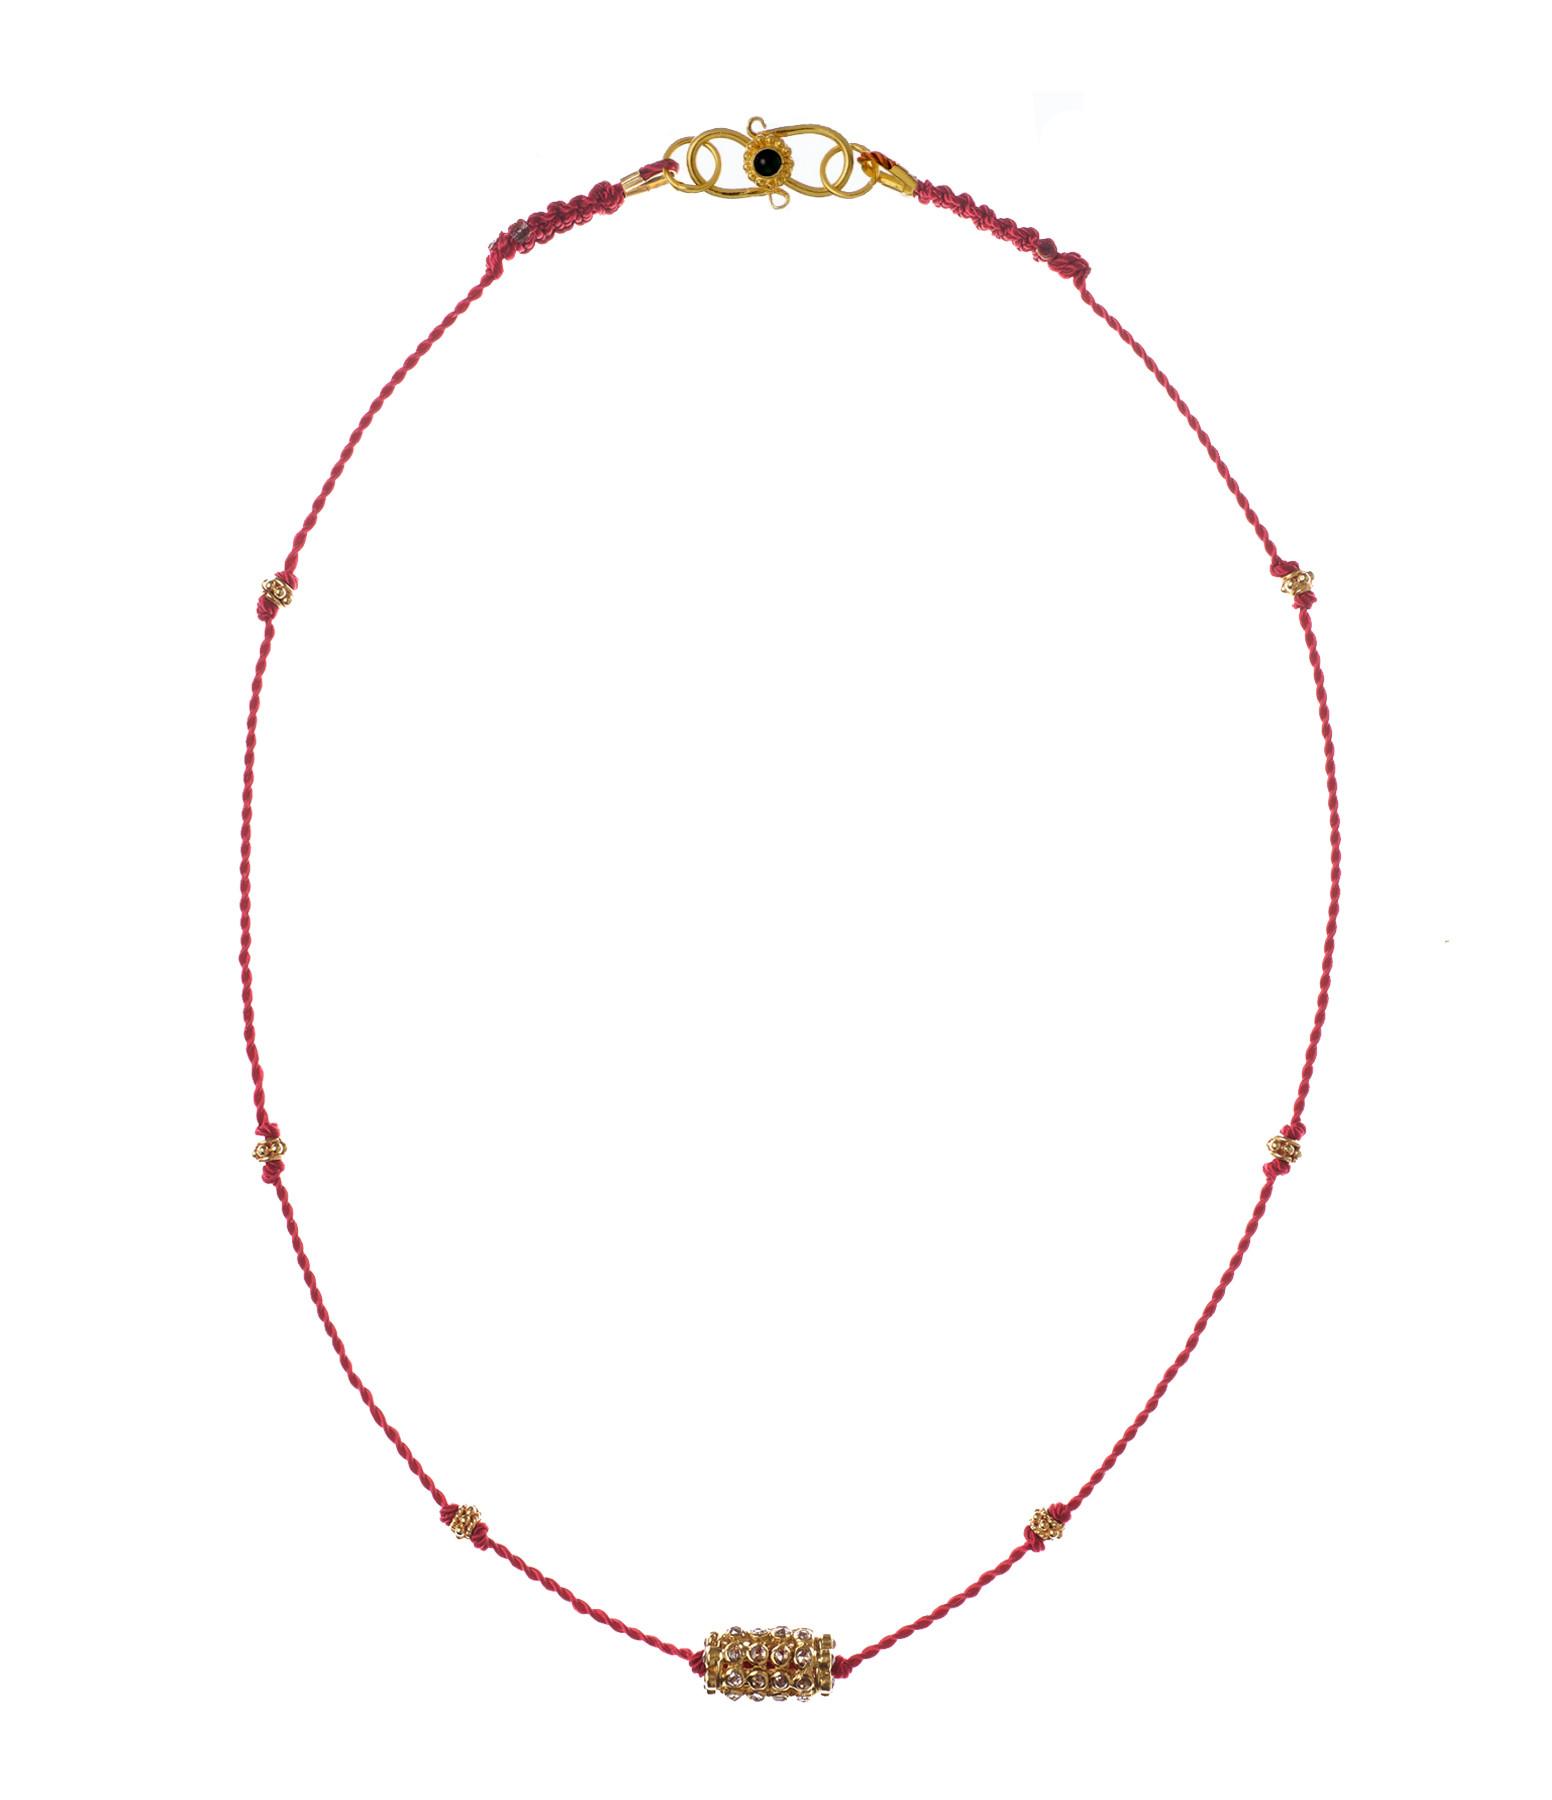 TITYARAVY - Collier Shakti Diamants Or